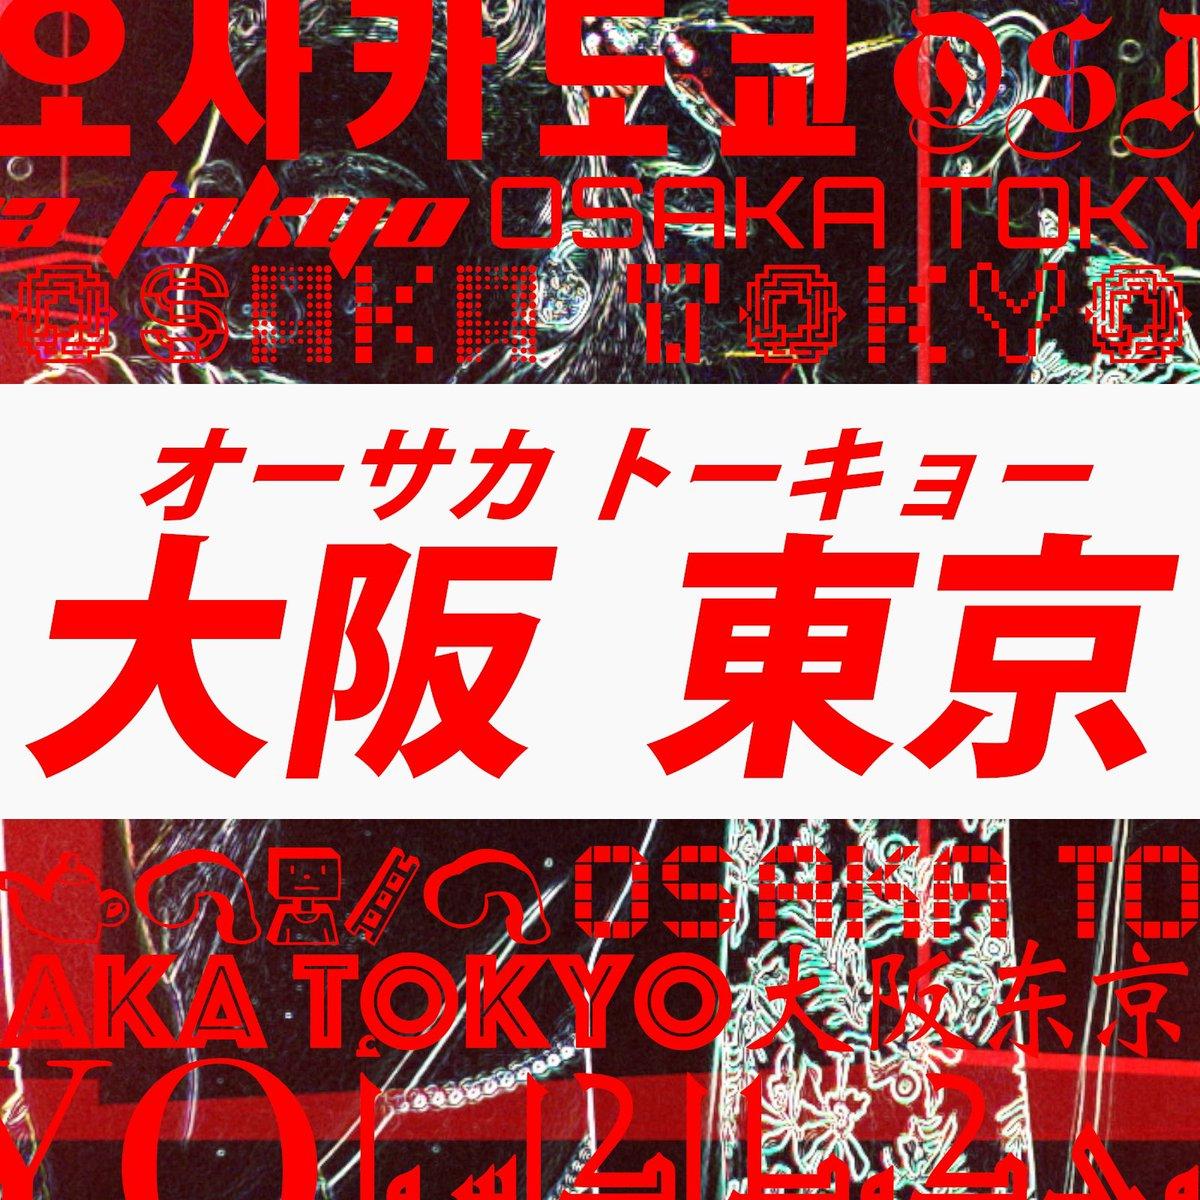 EXILE ATSUSHI x 倖田來未 - オーサカトーキョー [2020.07.28+MP3+RAR]